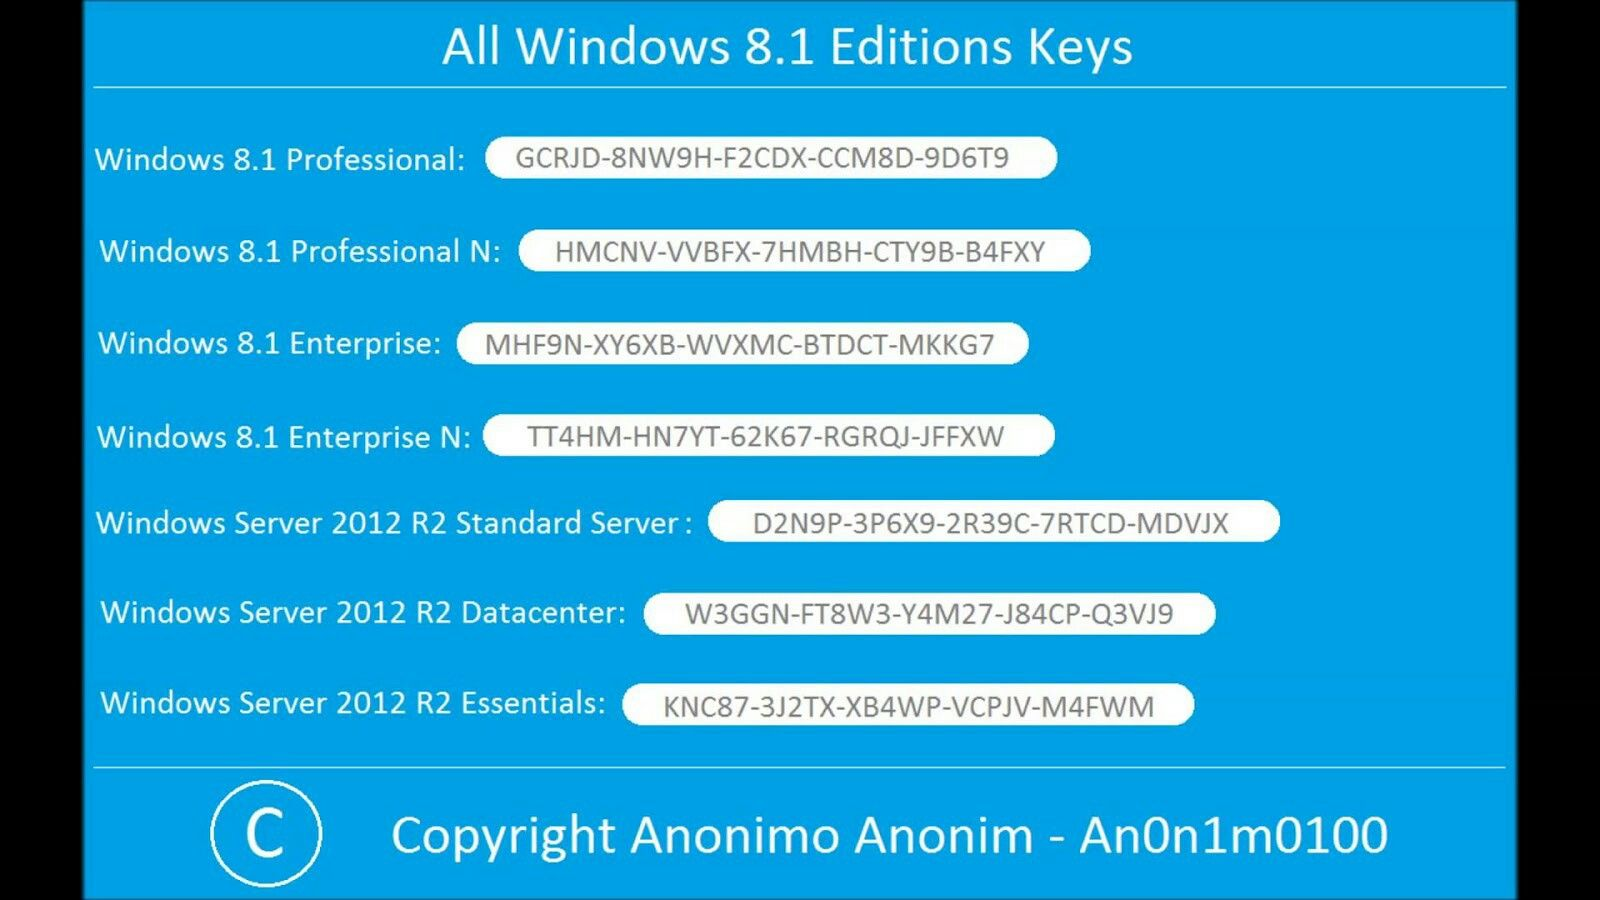 Pin By Ursu Cristian On Tehnologie Universal Windows Windows